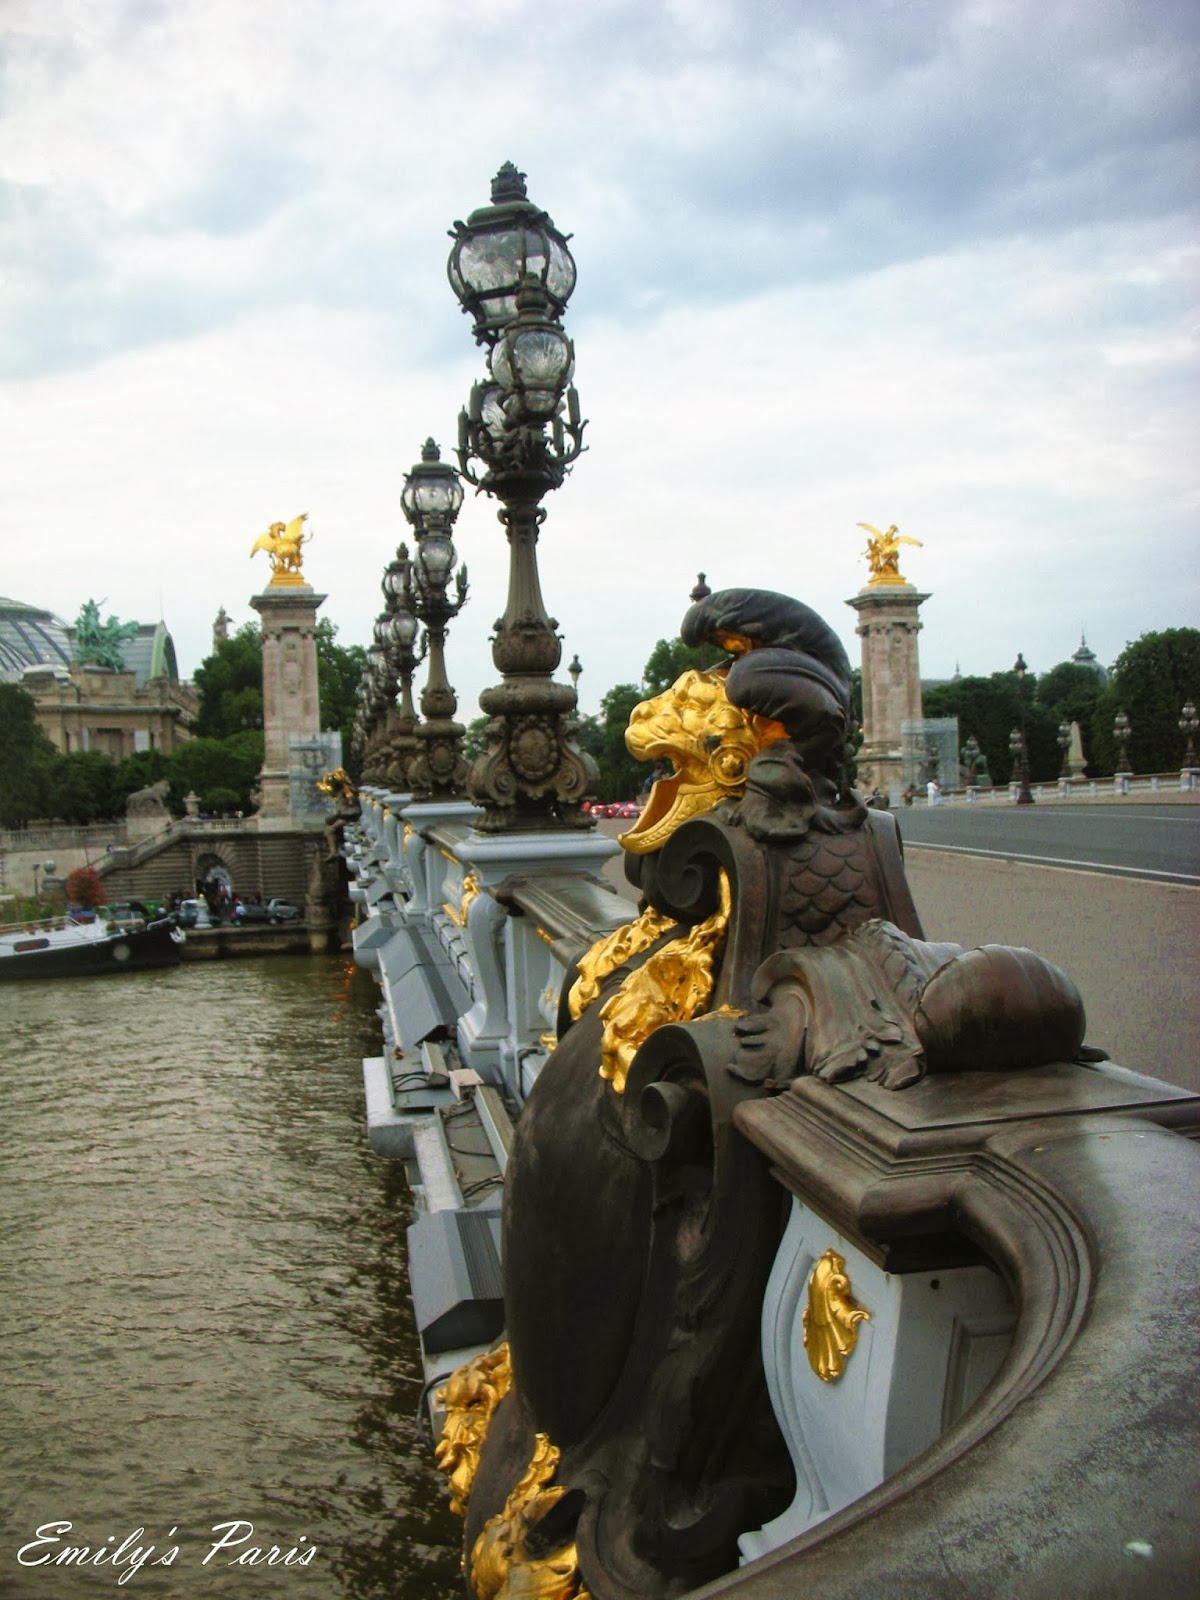 A good year in France: 2013年6月法國巴黎之旅~艾菲爾鐵塔La Tour Eiffel,亞歷山大三世橋Pont Alexandre III